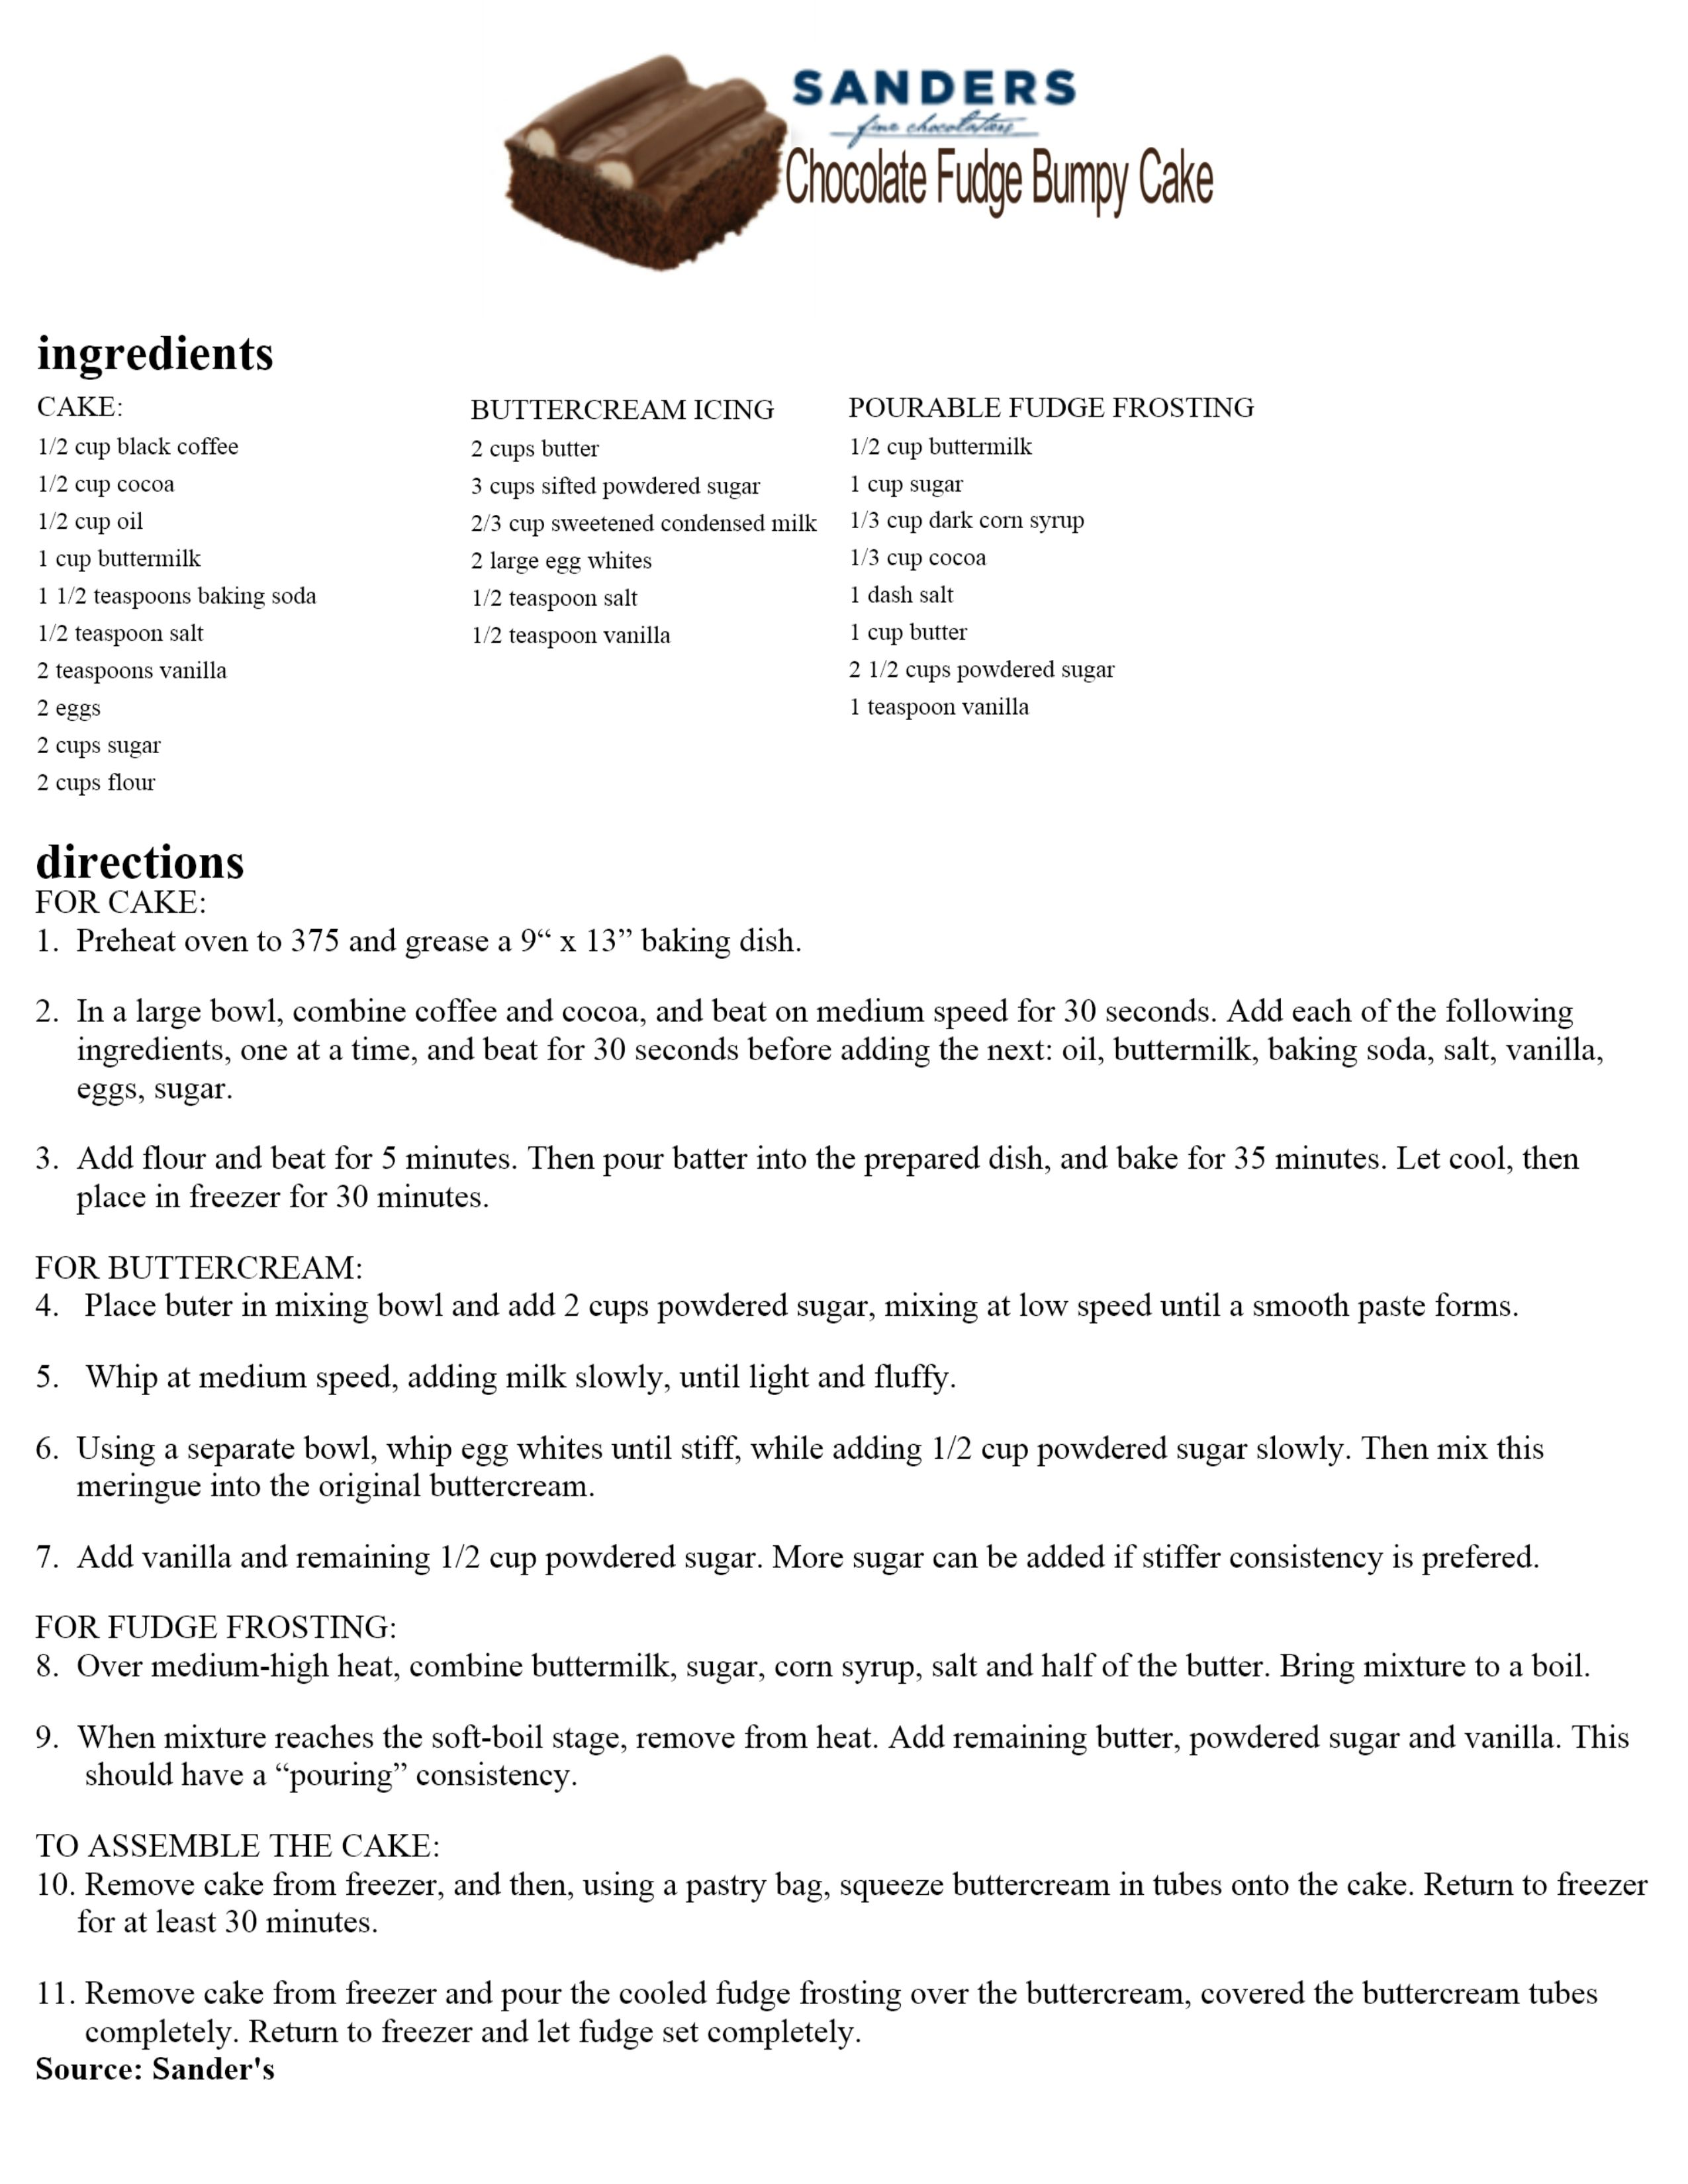 Sanders bumpy cake recipes